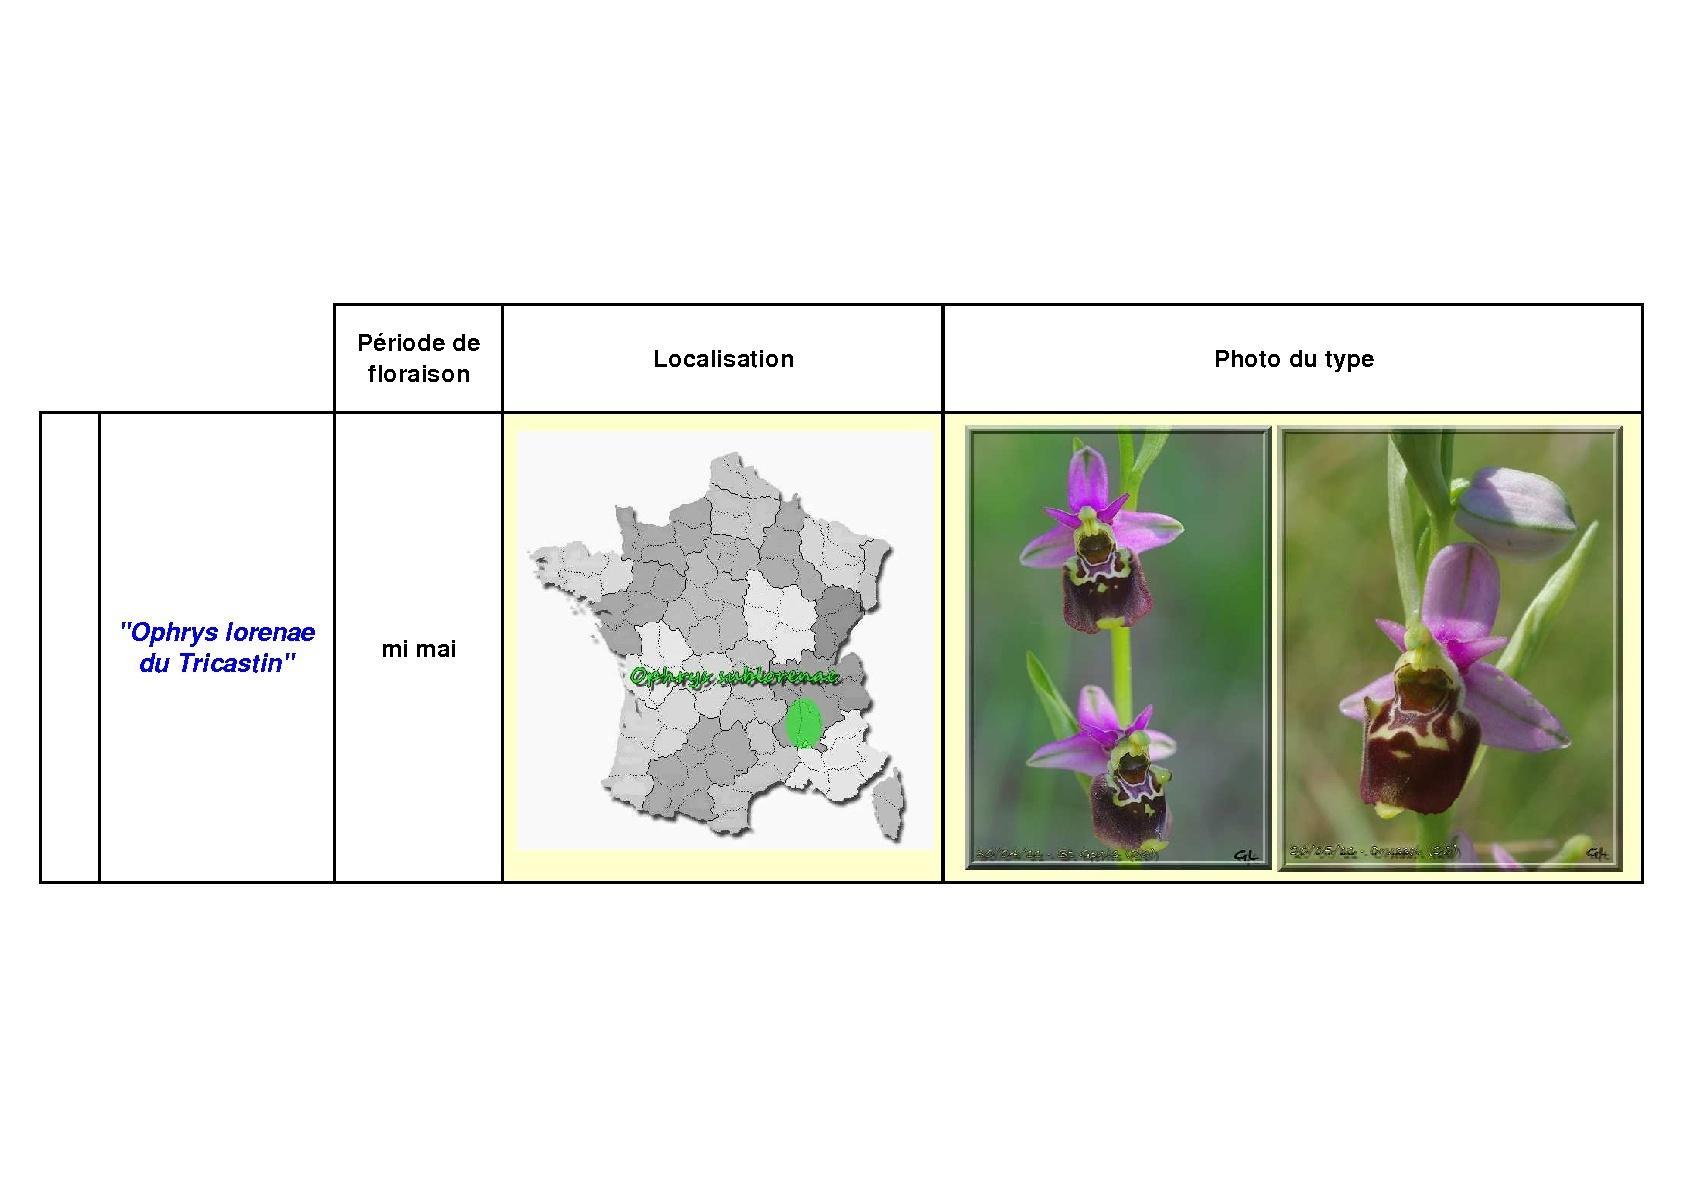 Le complexe fuciflora du Sud Est... simplifié Fucifl21